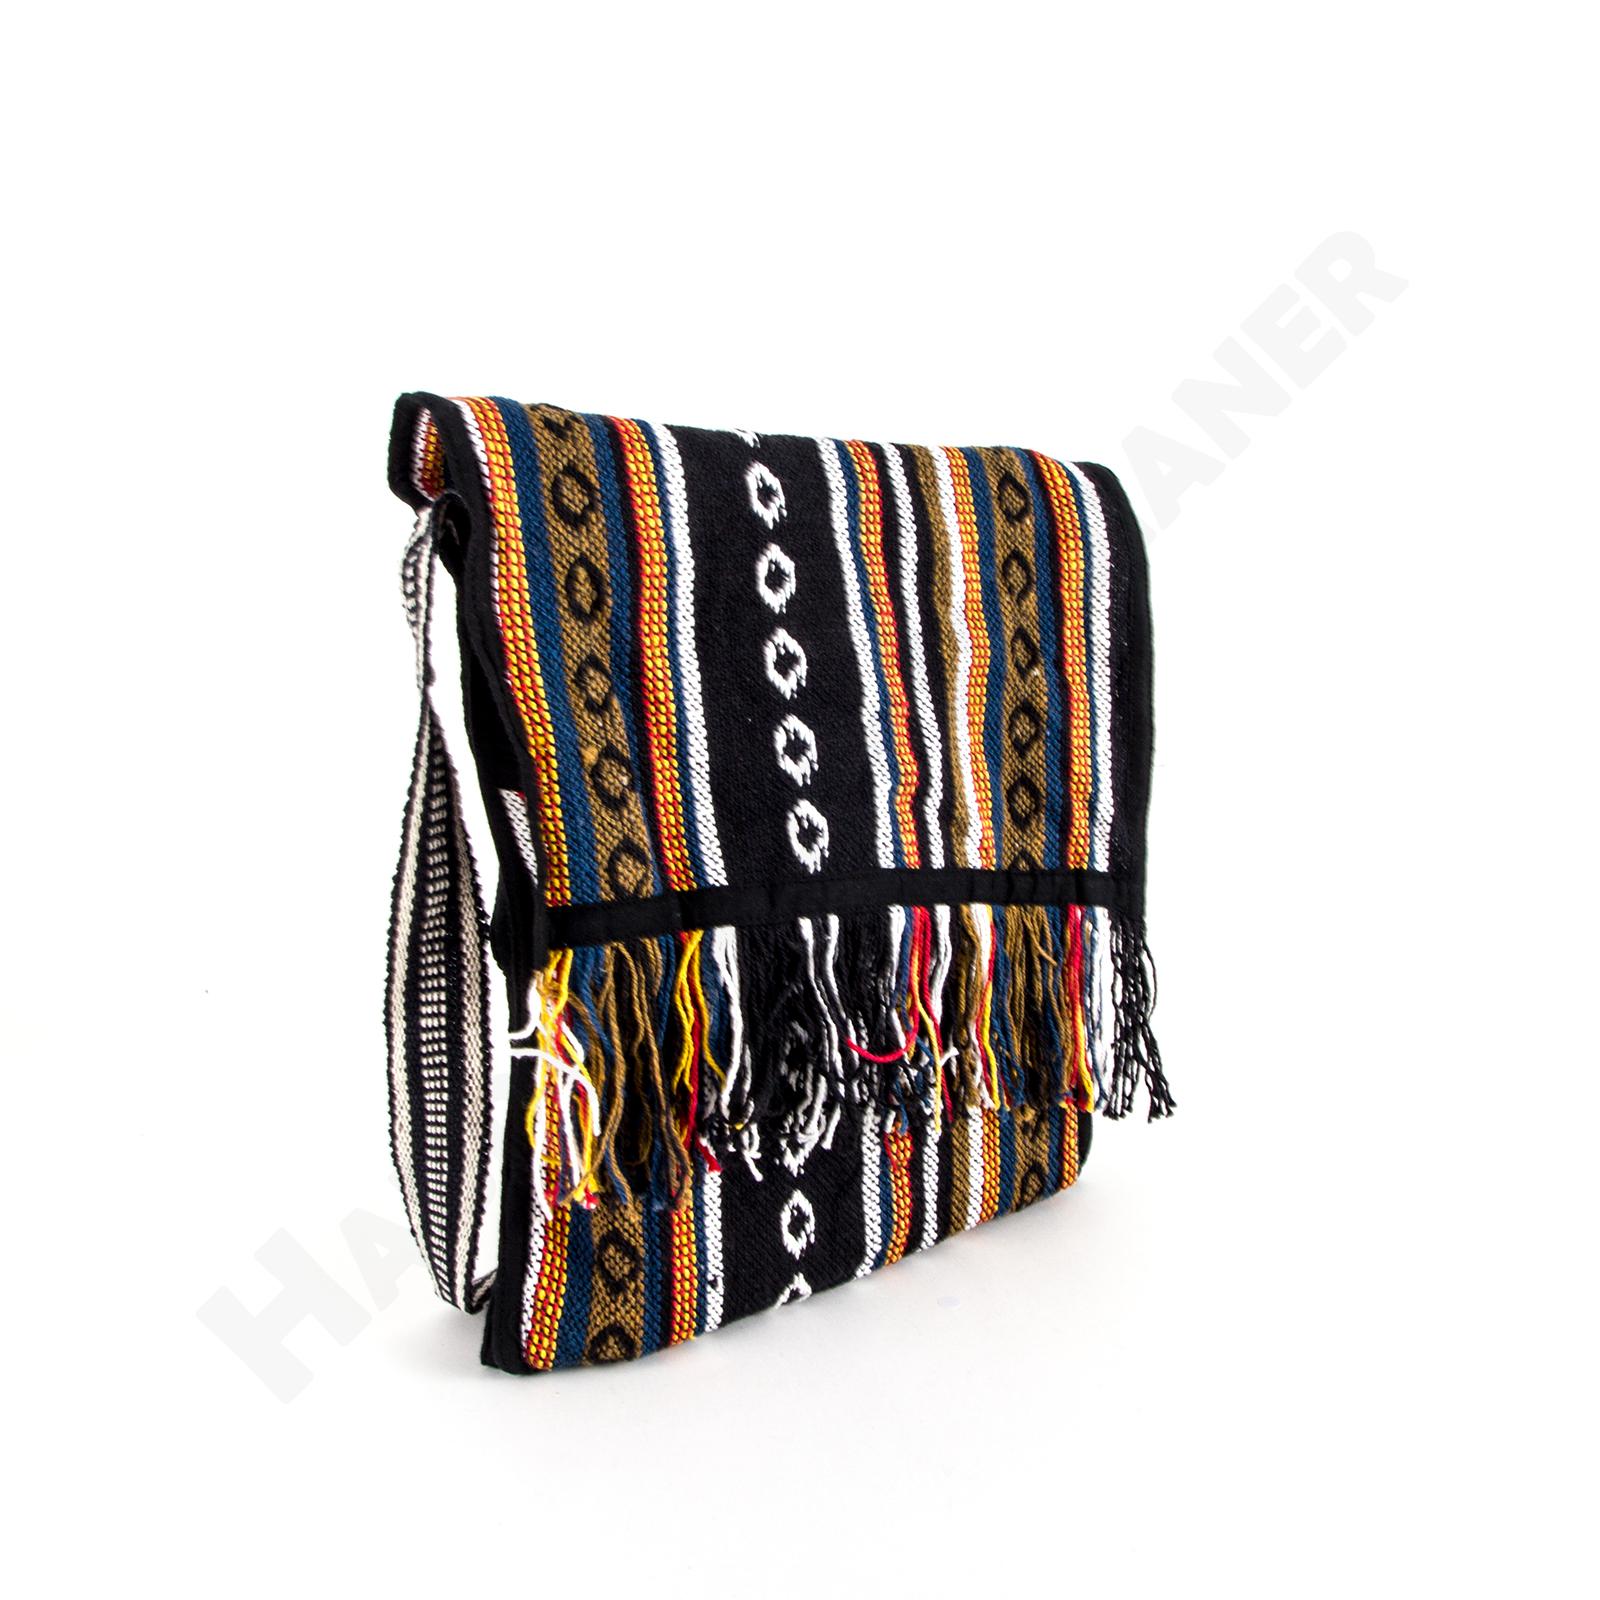 tasche umh ngetasche indianer fransen ethno muster verschiedene farben bunt. Black Bedroom Furniture Sets. Home Design Ideas